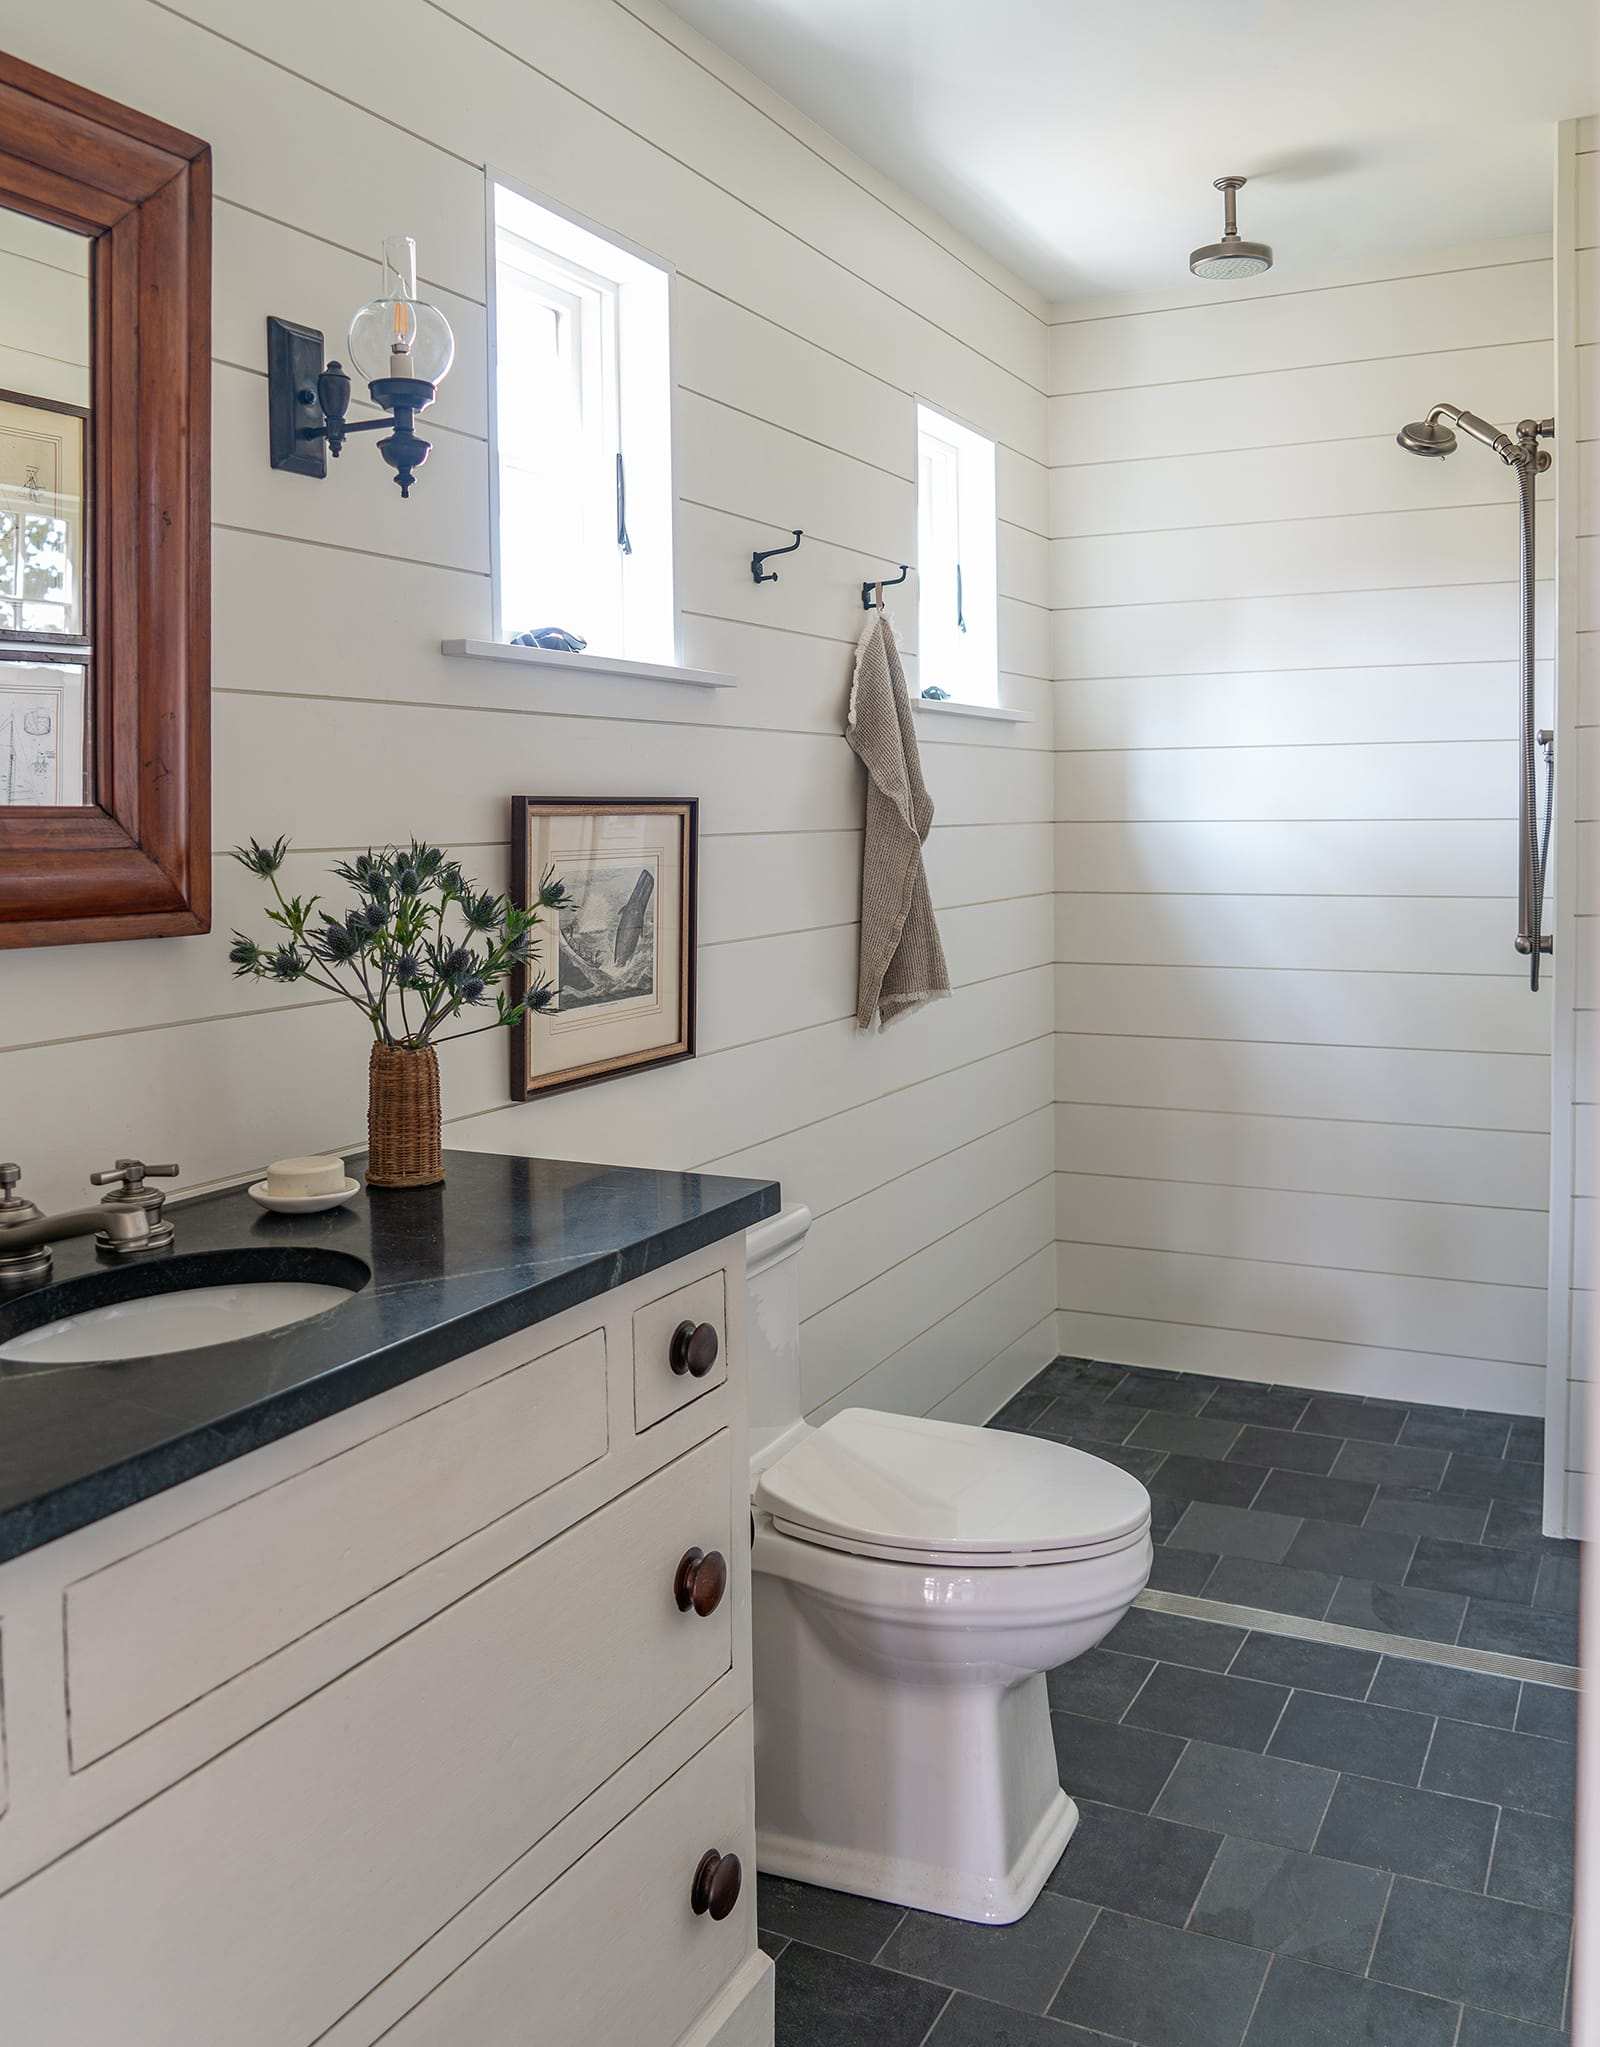 Arrowhead Farmhouse Newburyport MA Bathroom lowrez